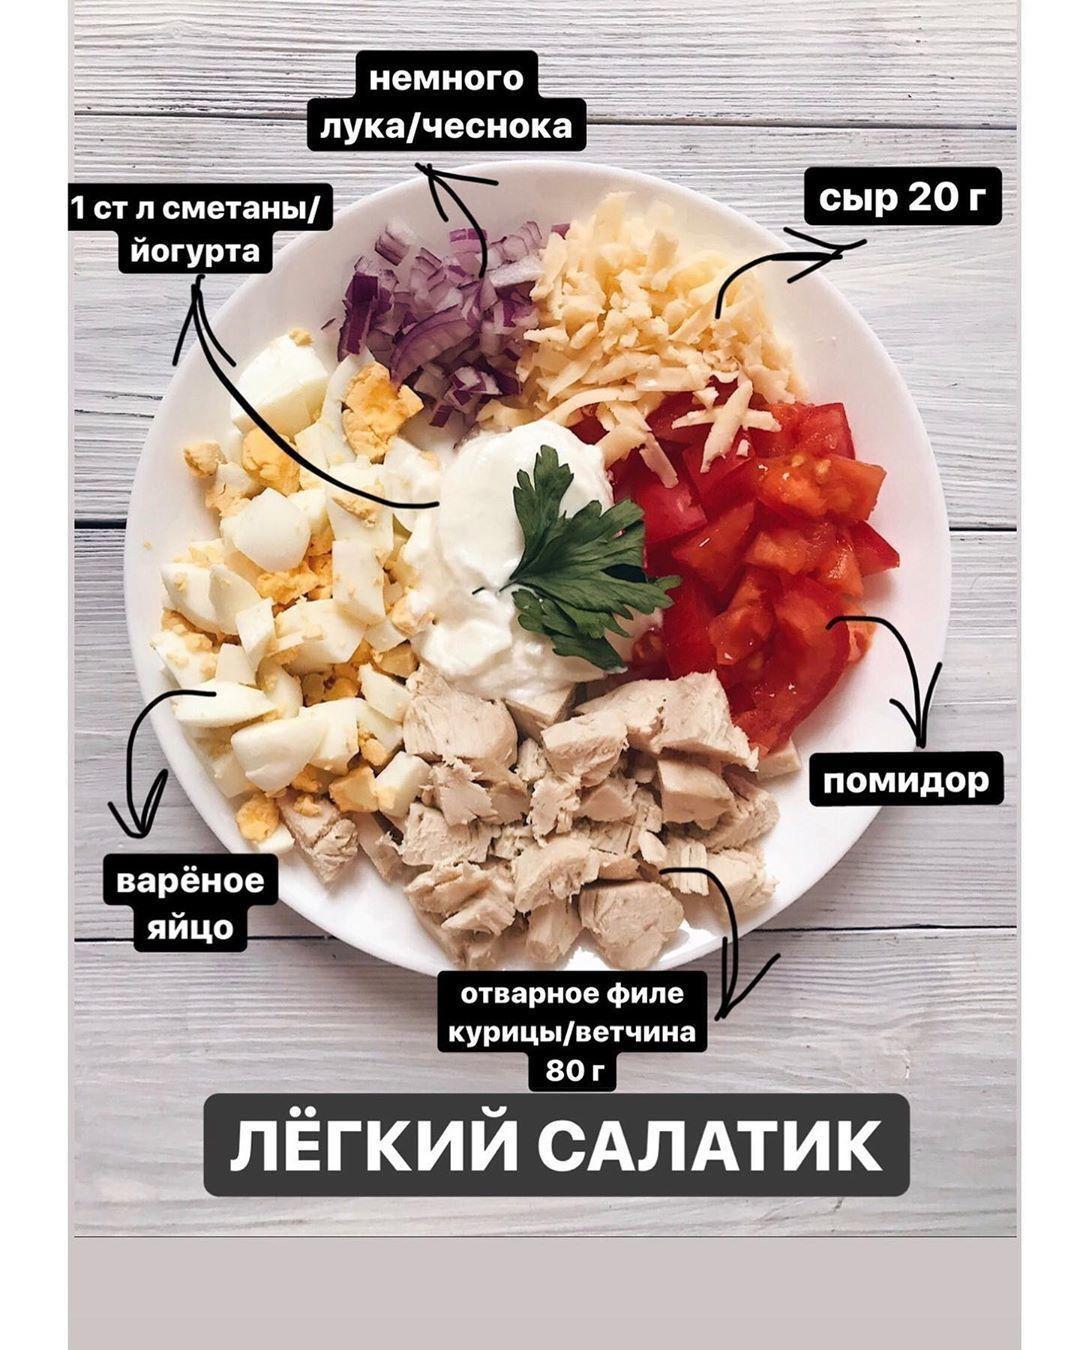 Вариант белкового салатика